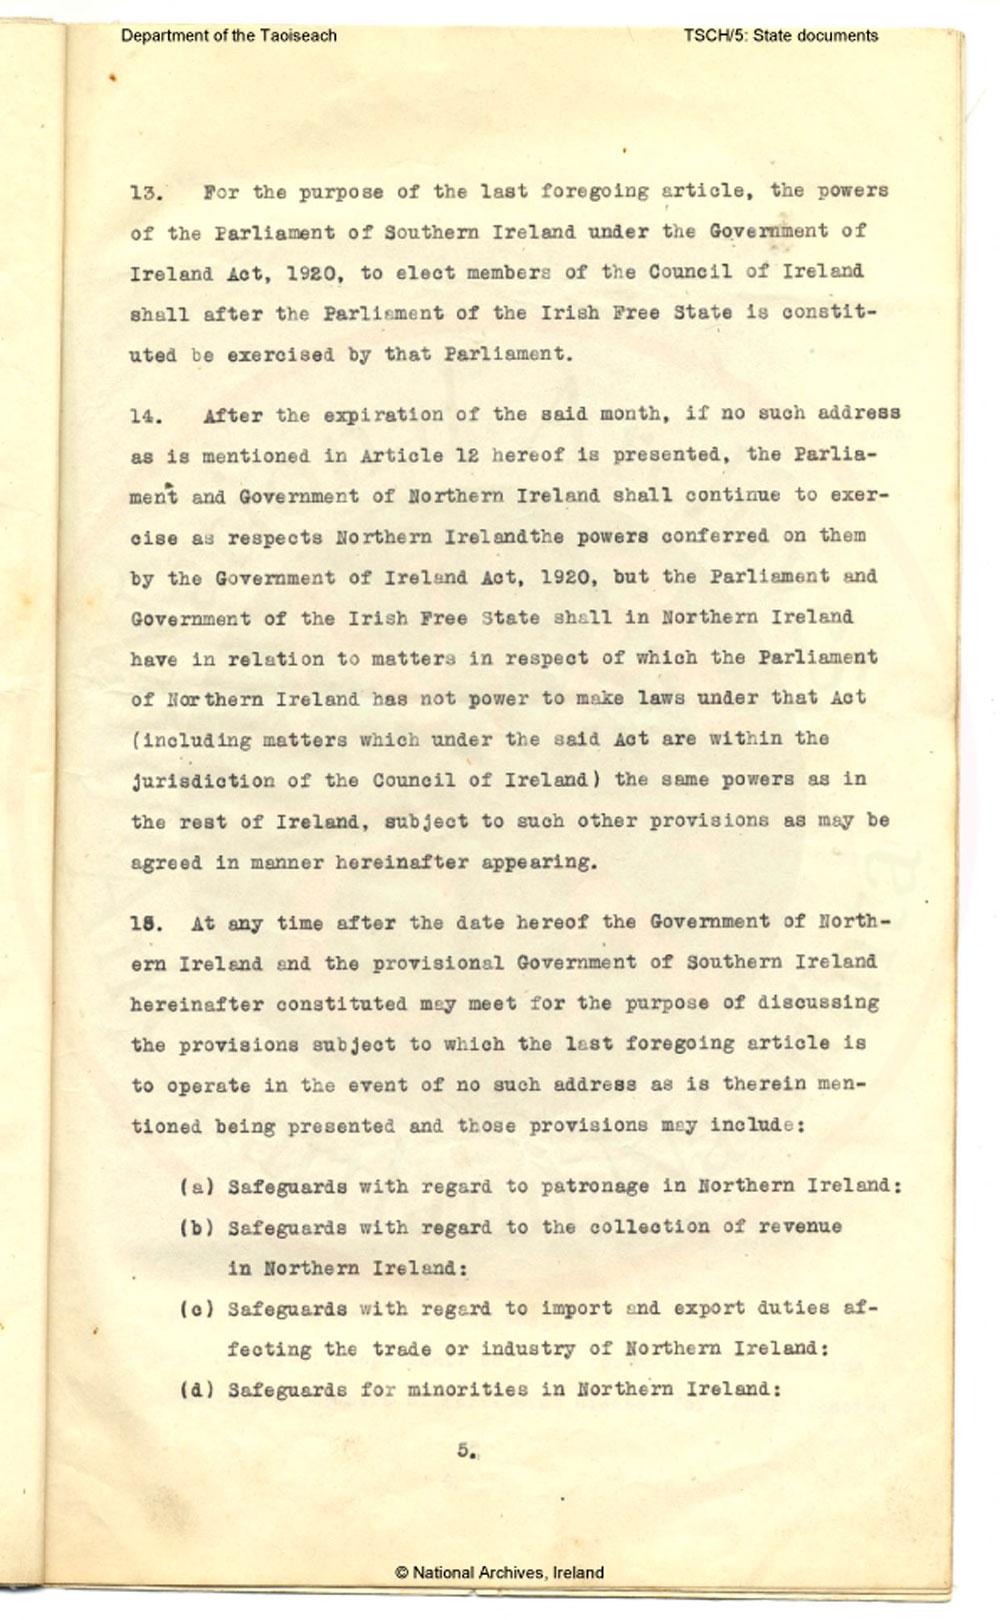 Anglo-Irish-Treaty-7